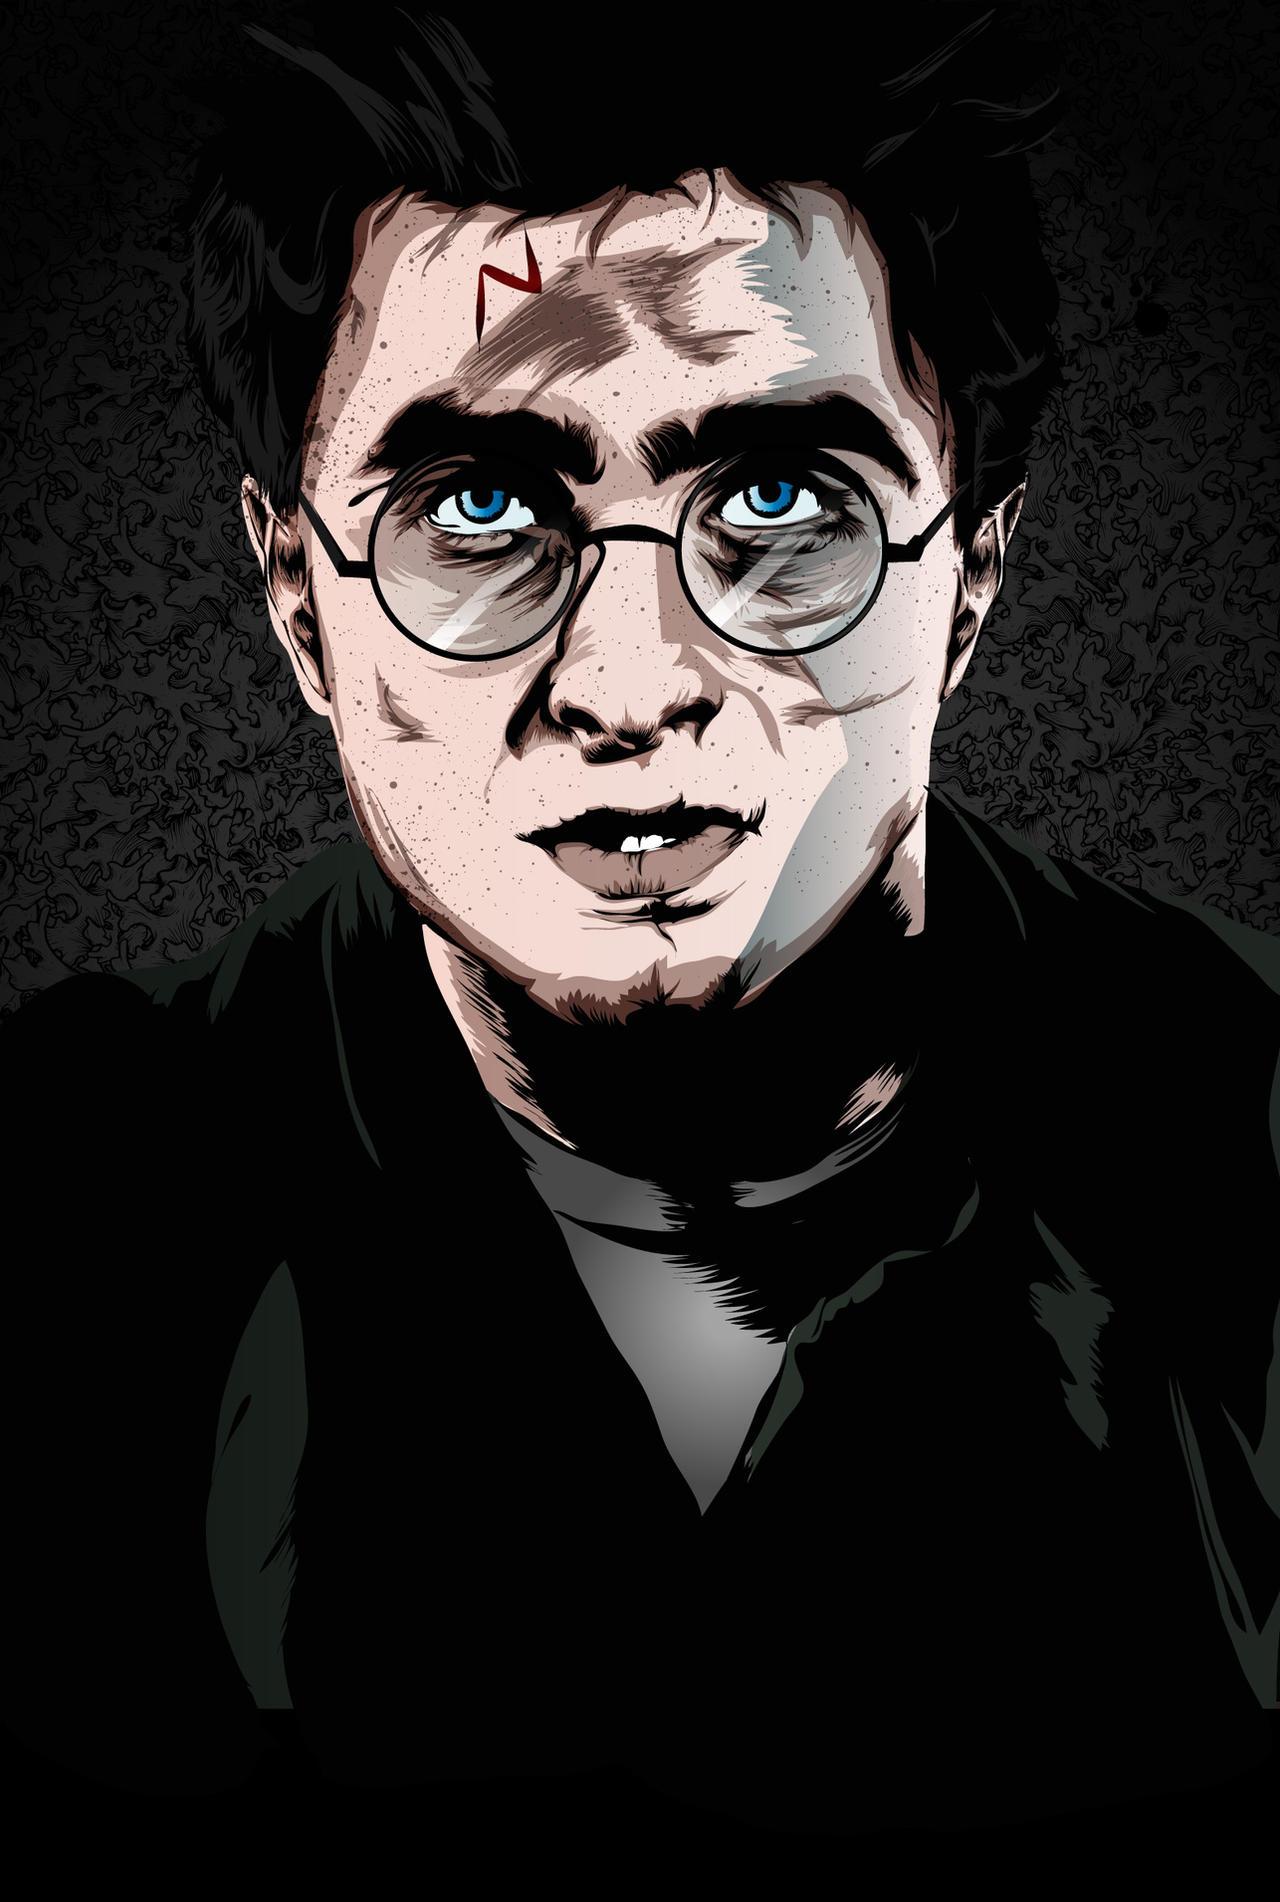 Harry Potter by artwarriors